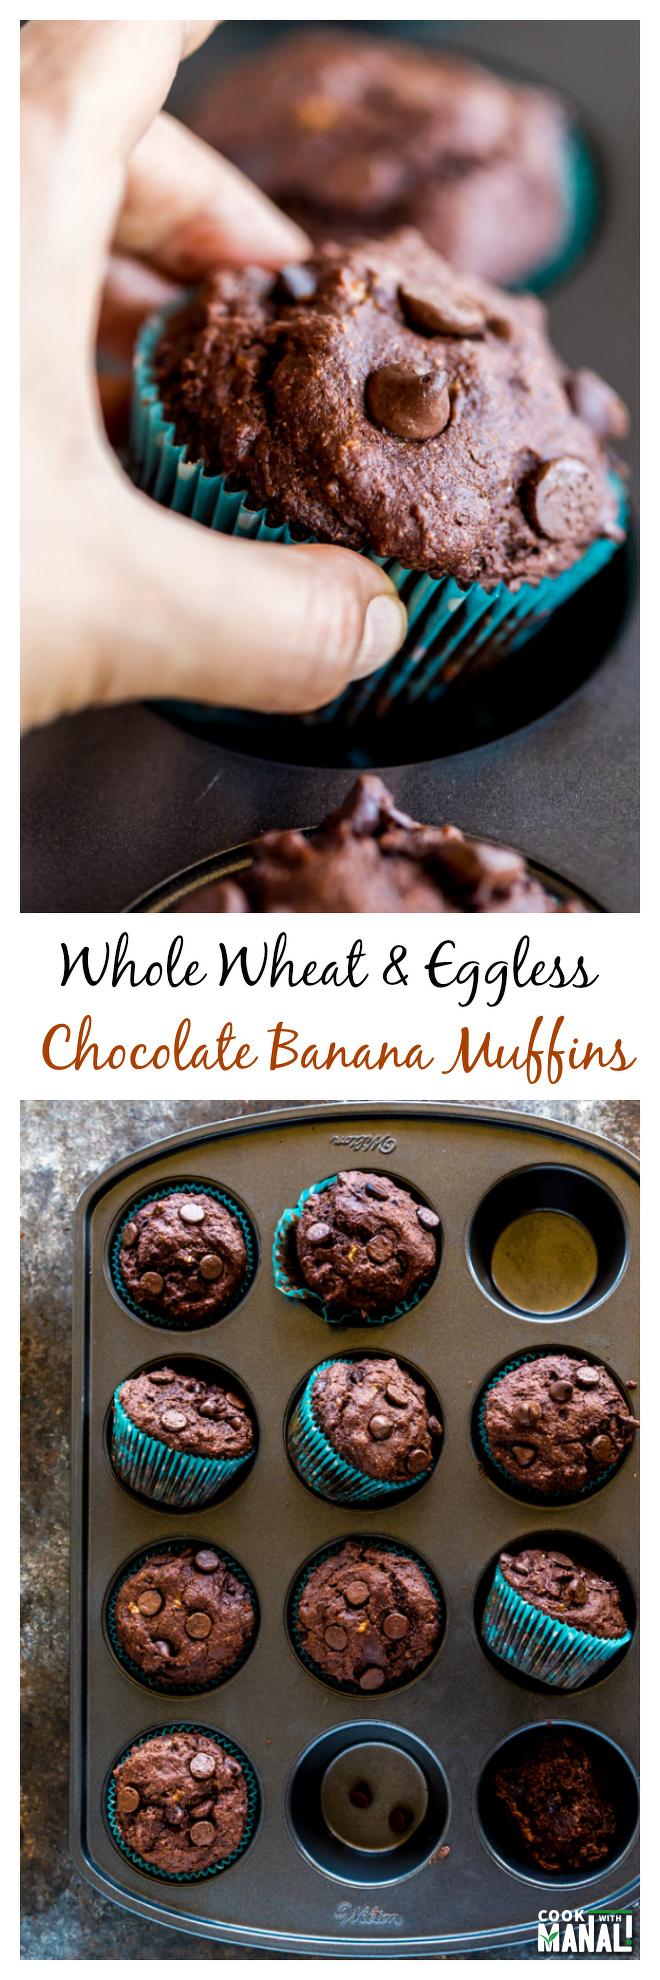 Whole Wheat Chocolate Banana Muffins Collage